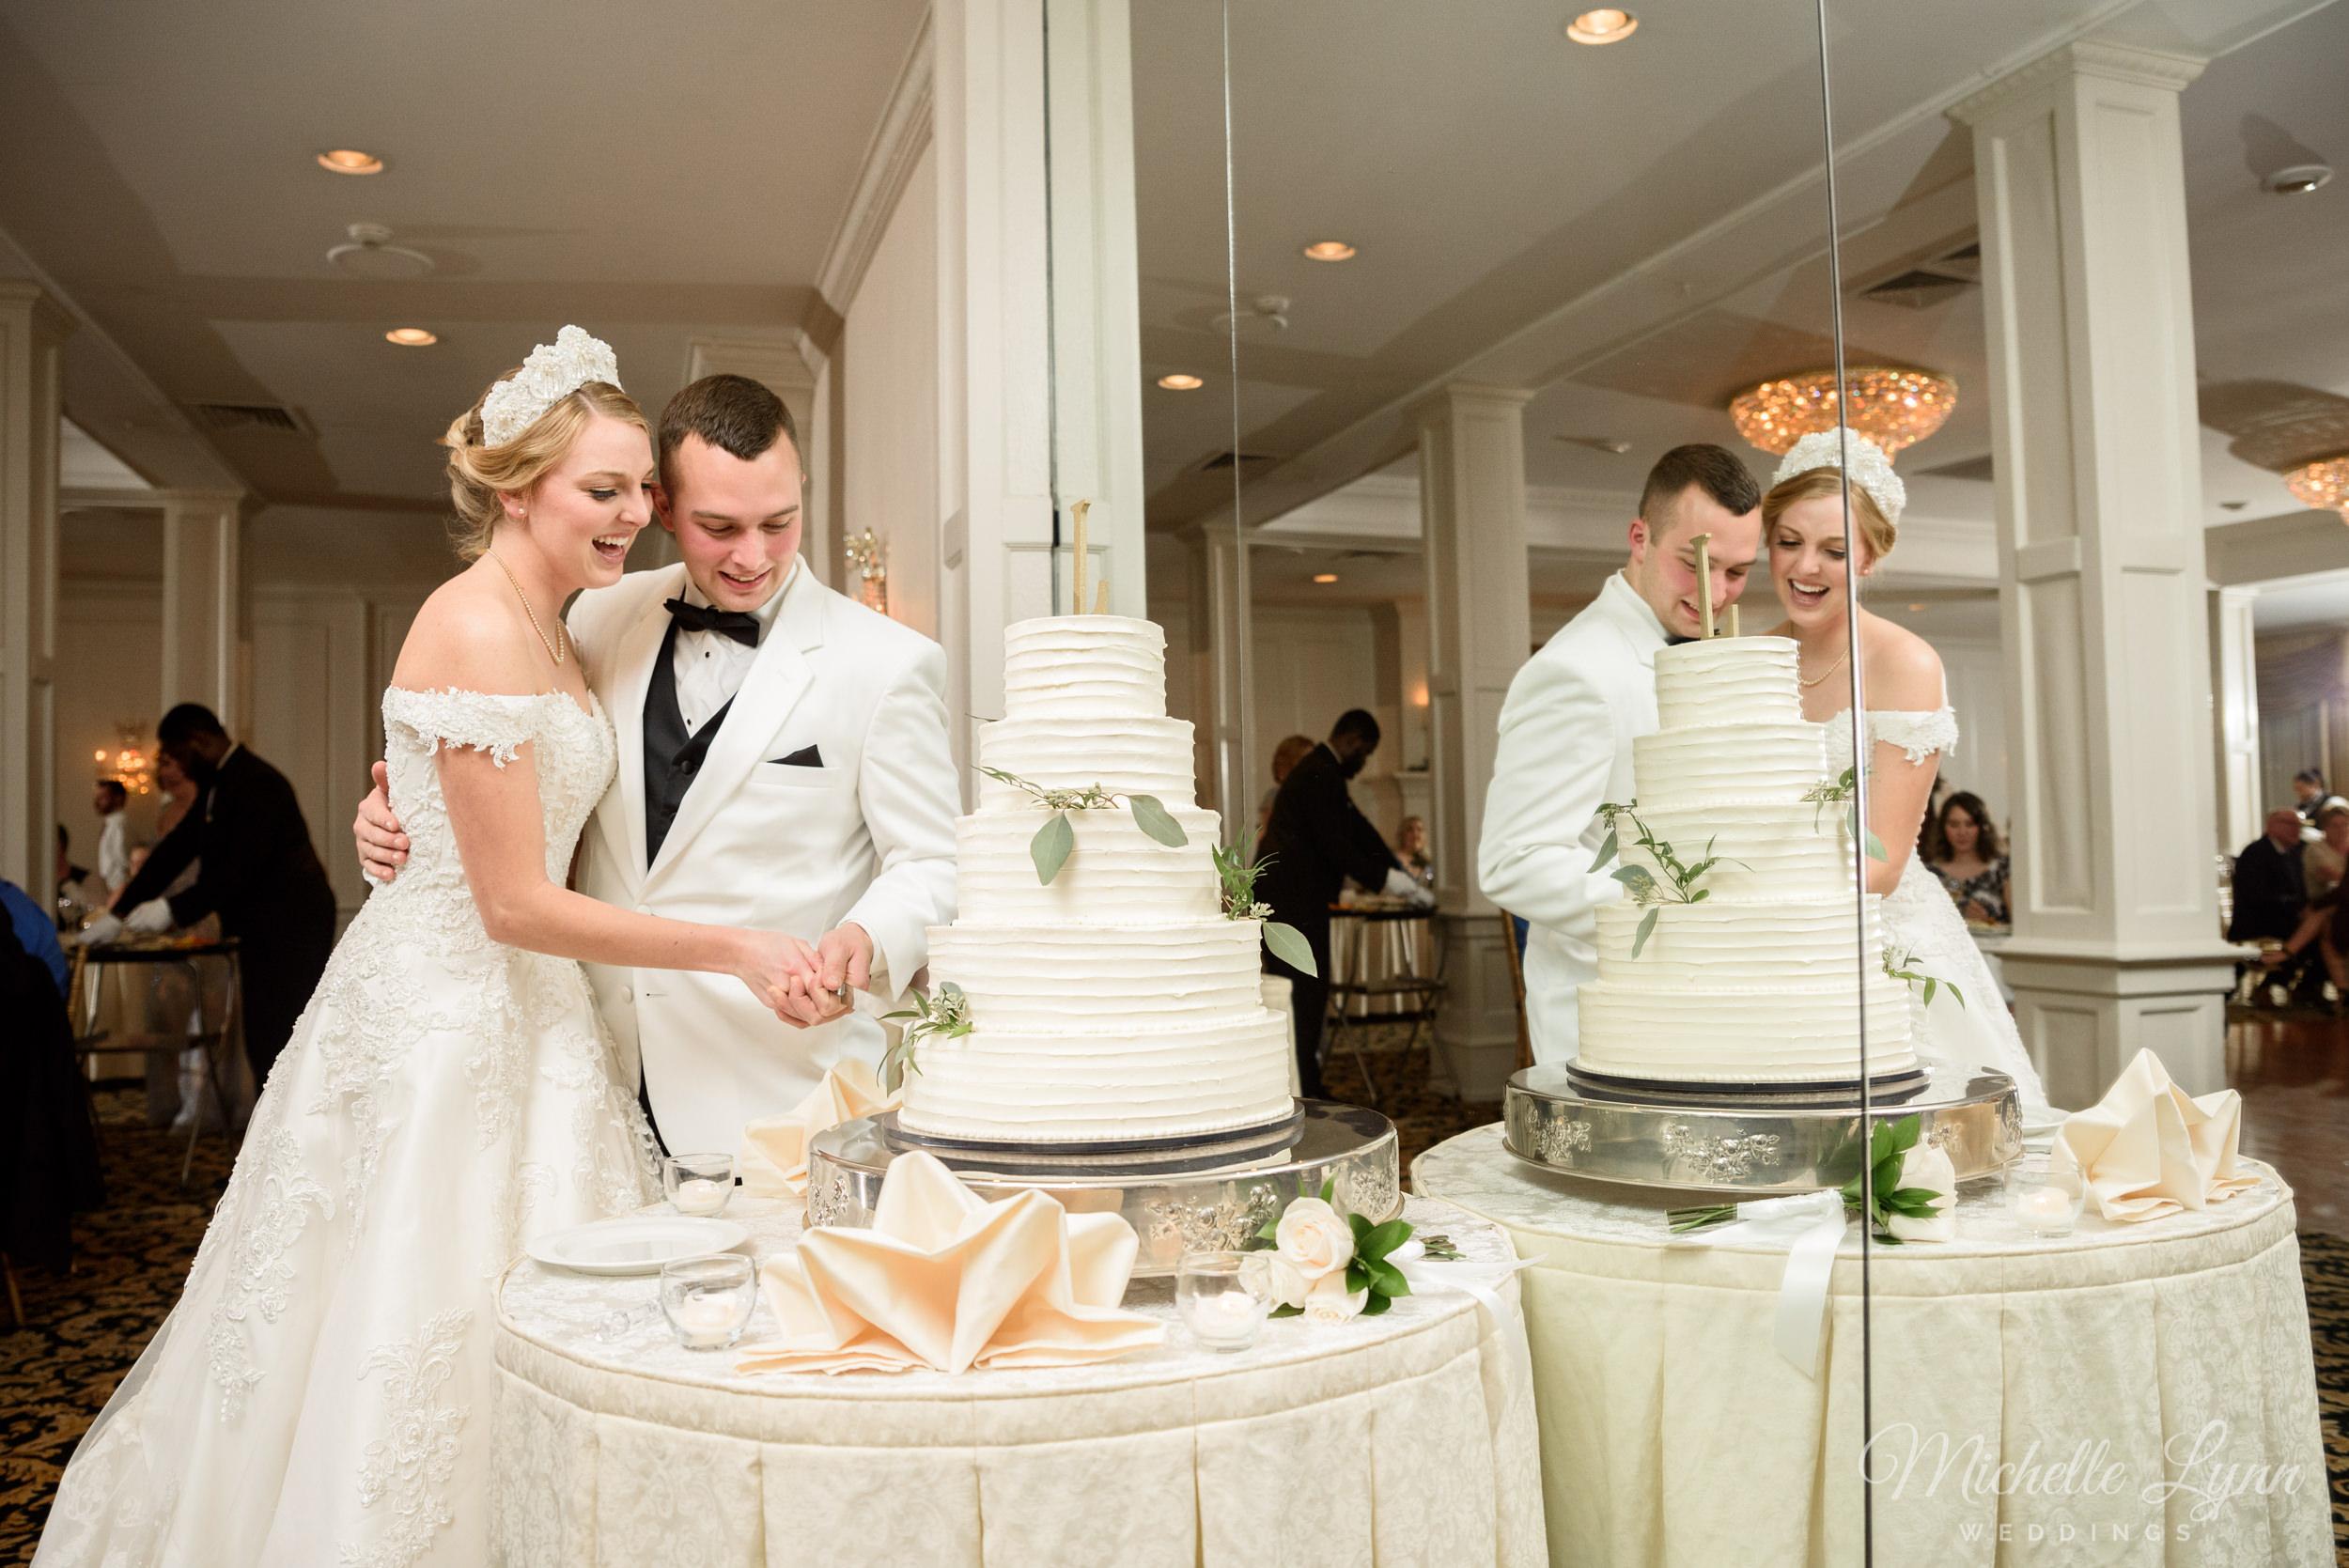 william-penn-inn-wedding-photography-mlw-96.jpg